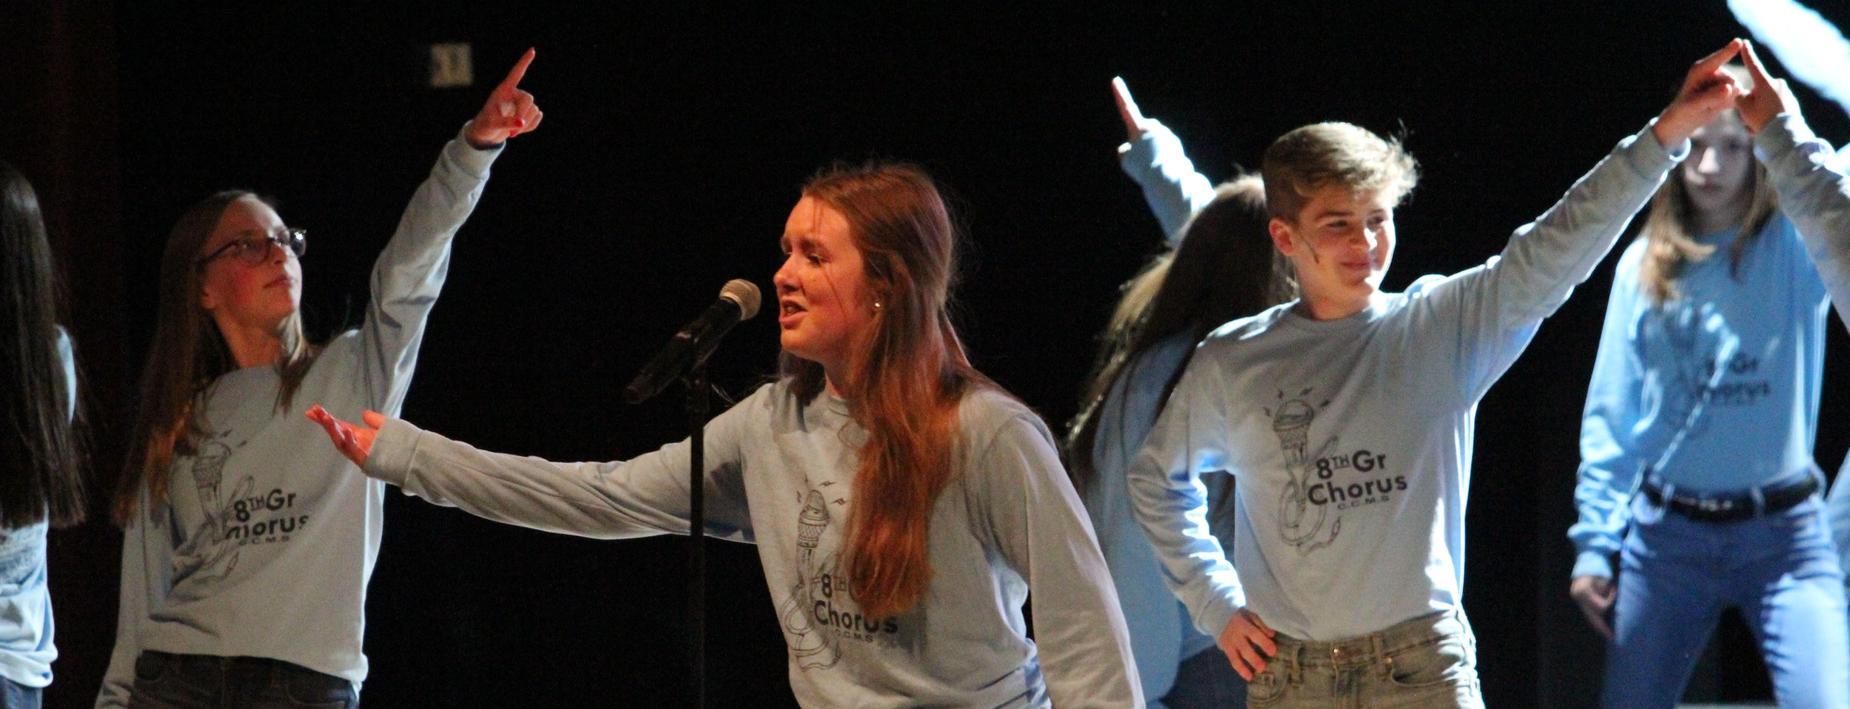 chorus concert with 8th grade